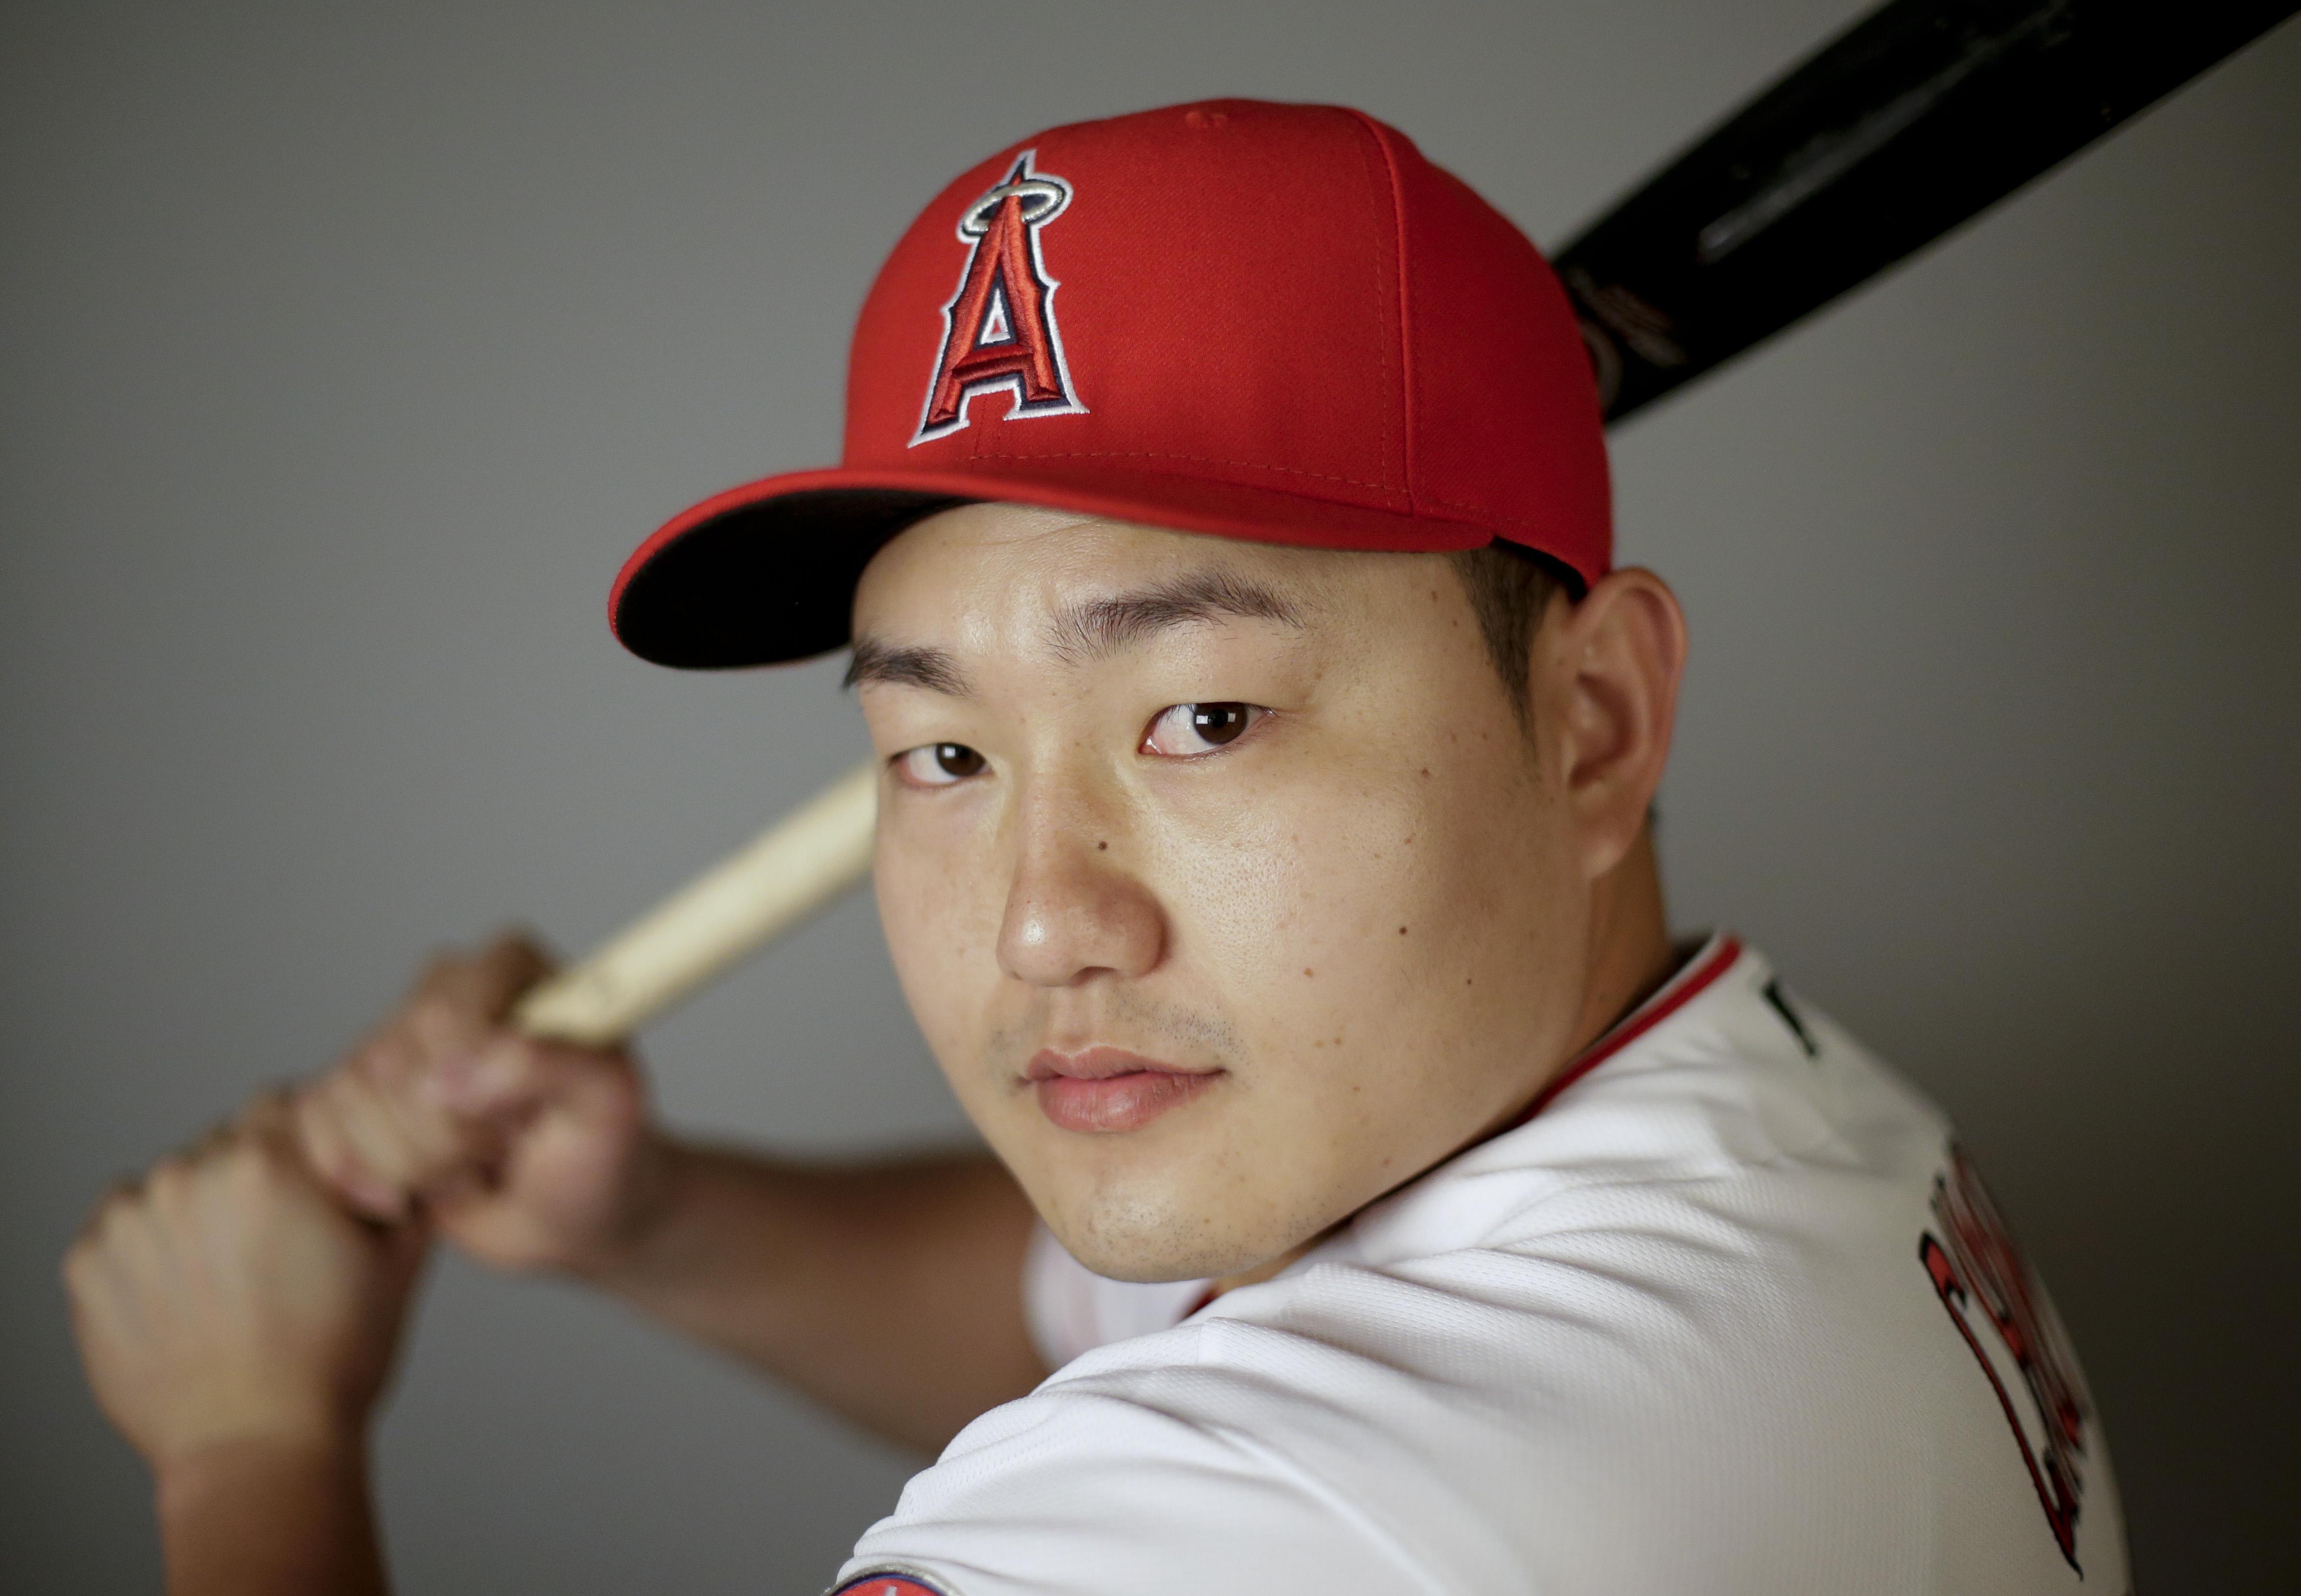 Angels Switch Hitting Choi